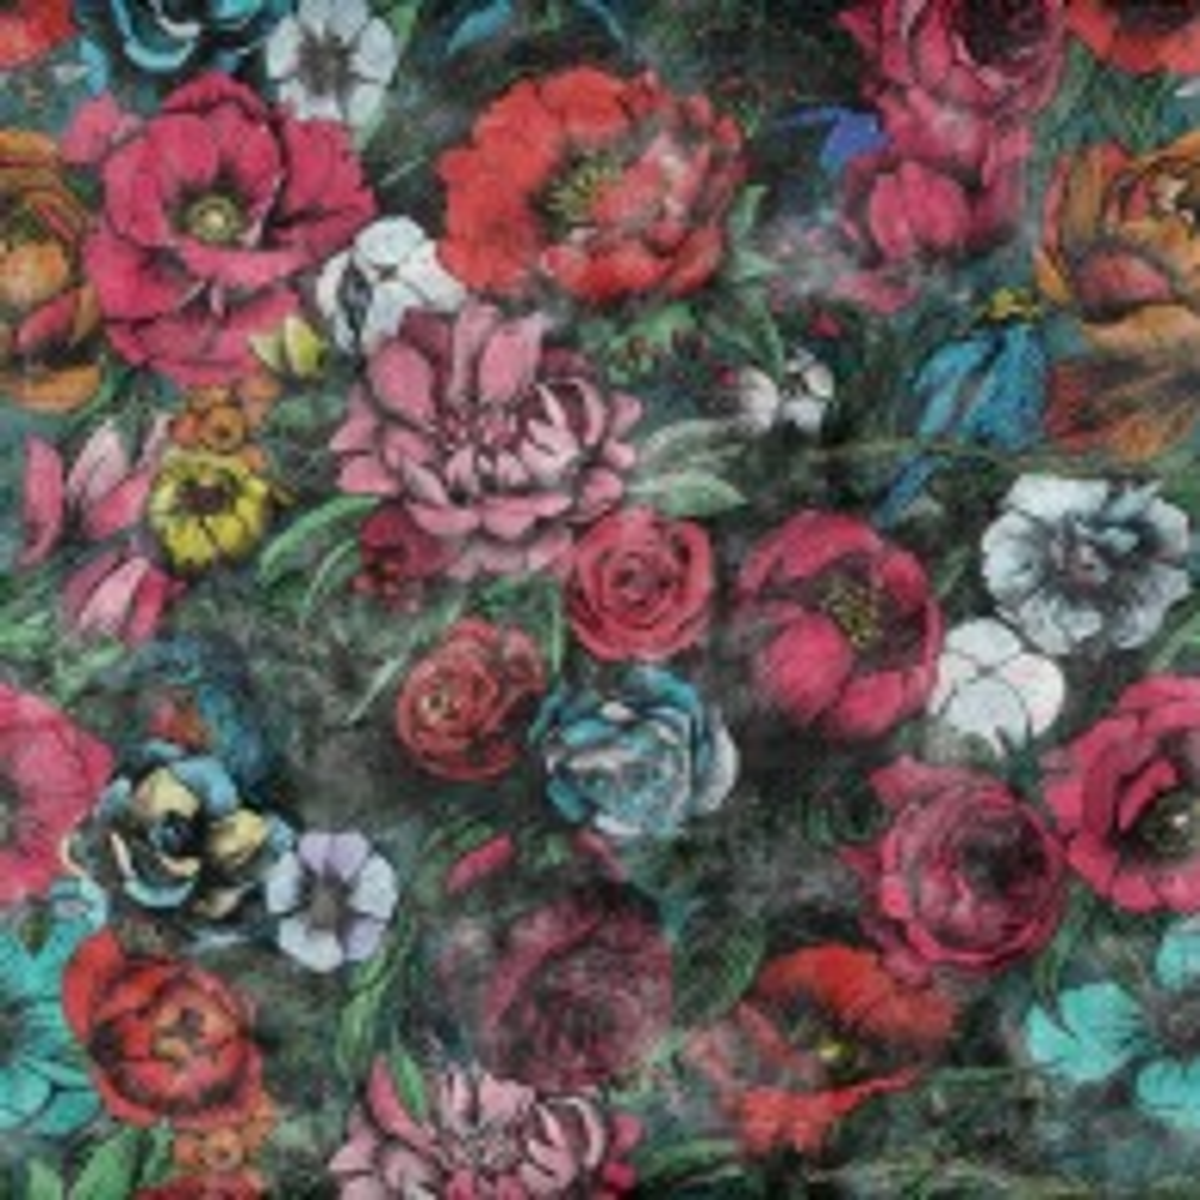 Grunge Style Pink Red Boho Floral Bouqet Pattern Wallpaper Mural